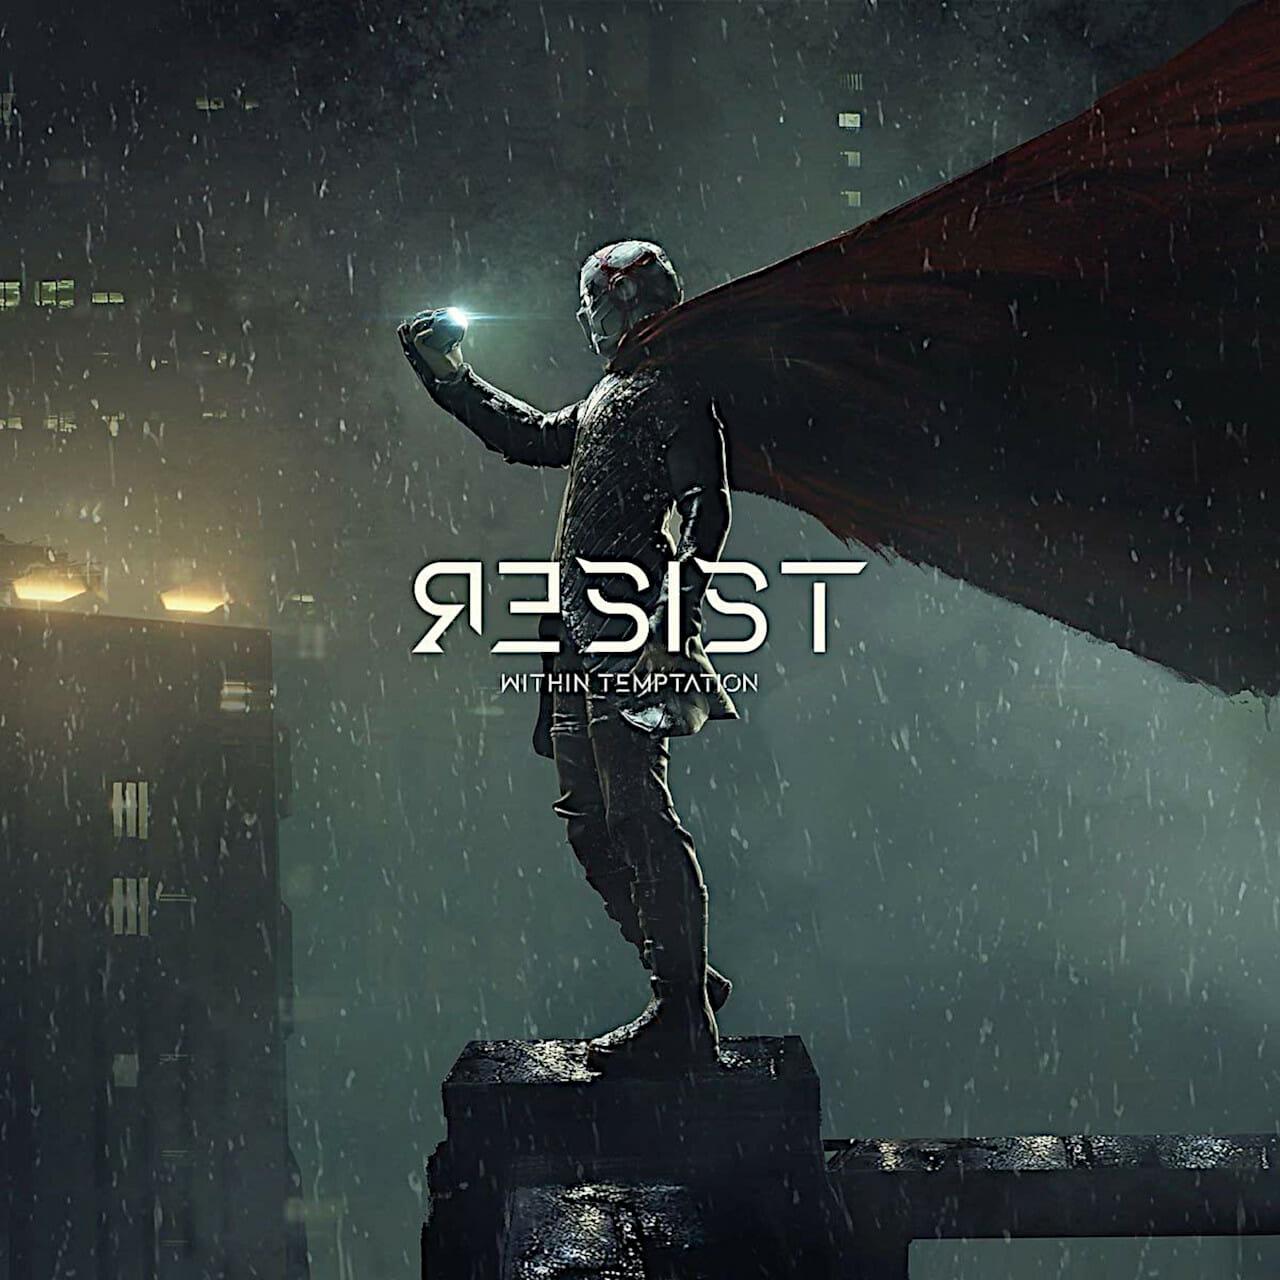 Within Temptation Álbum resistir